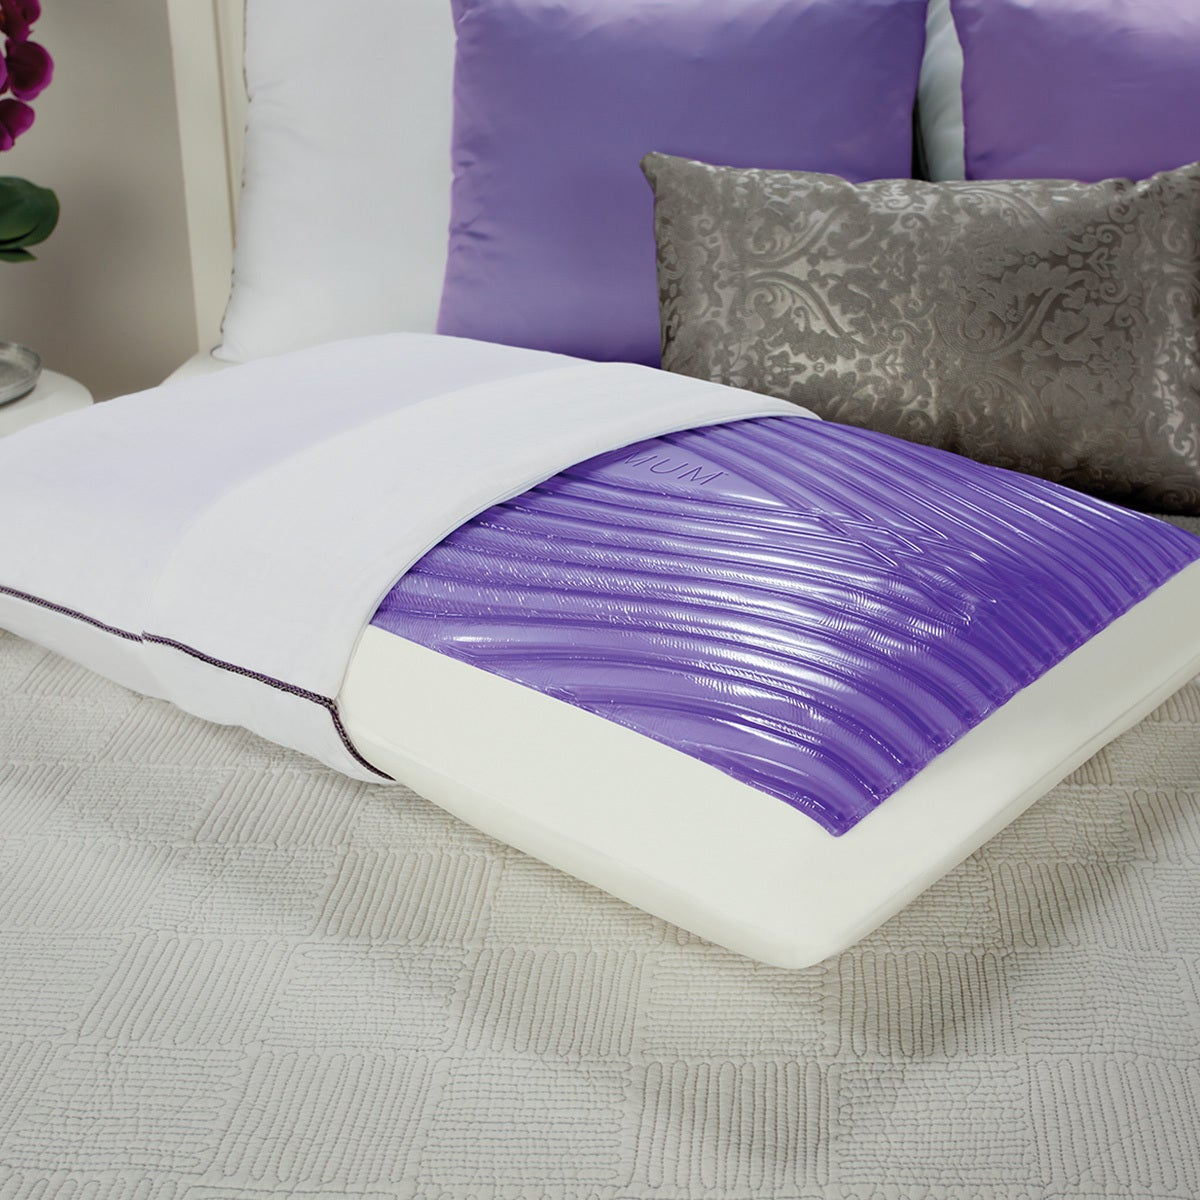 Sealy Optimum Optigel and Memory Foam Bed Pillow (Queen),...